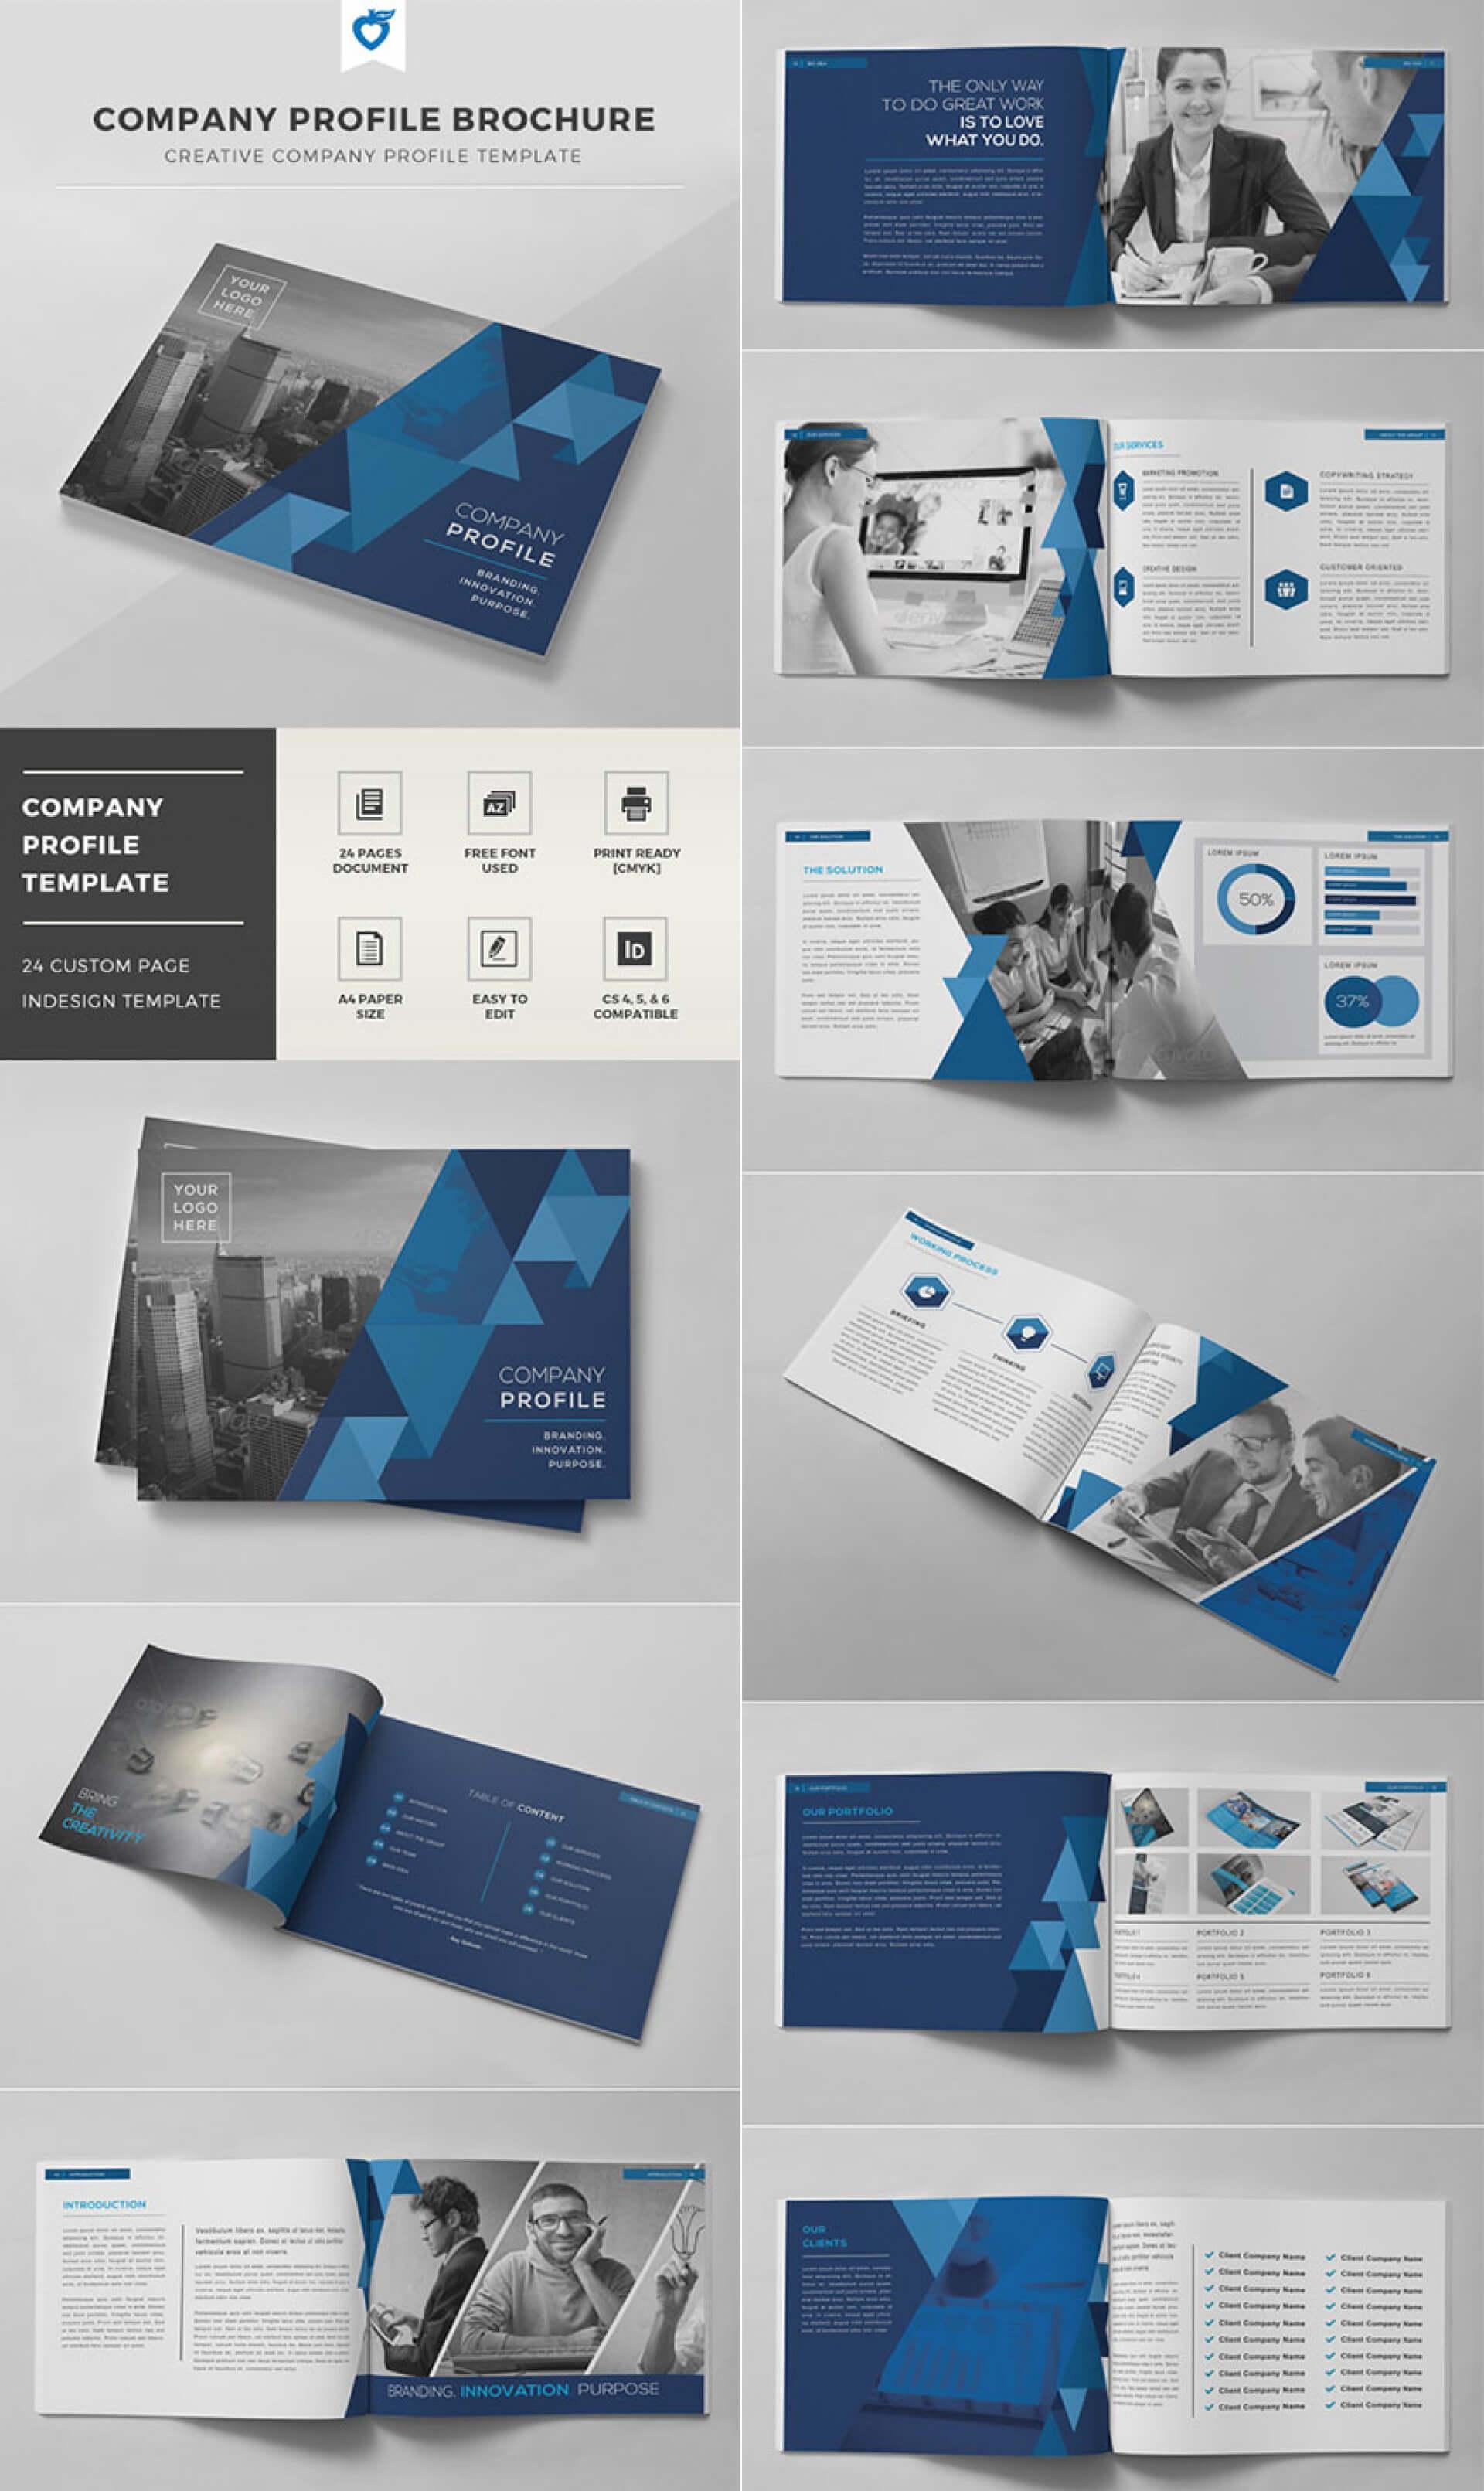 003 Indesign Brochure Templates Free Download Template Ideas within Brochure Templates Free Download Indesign